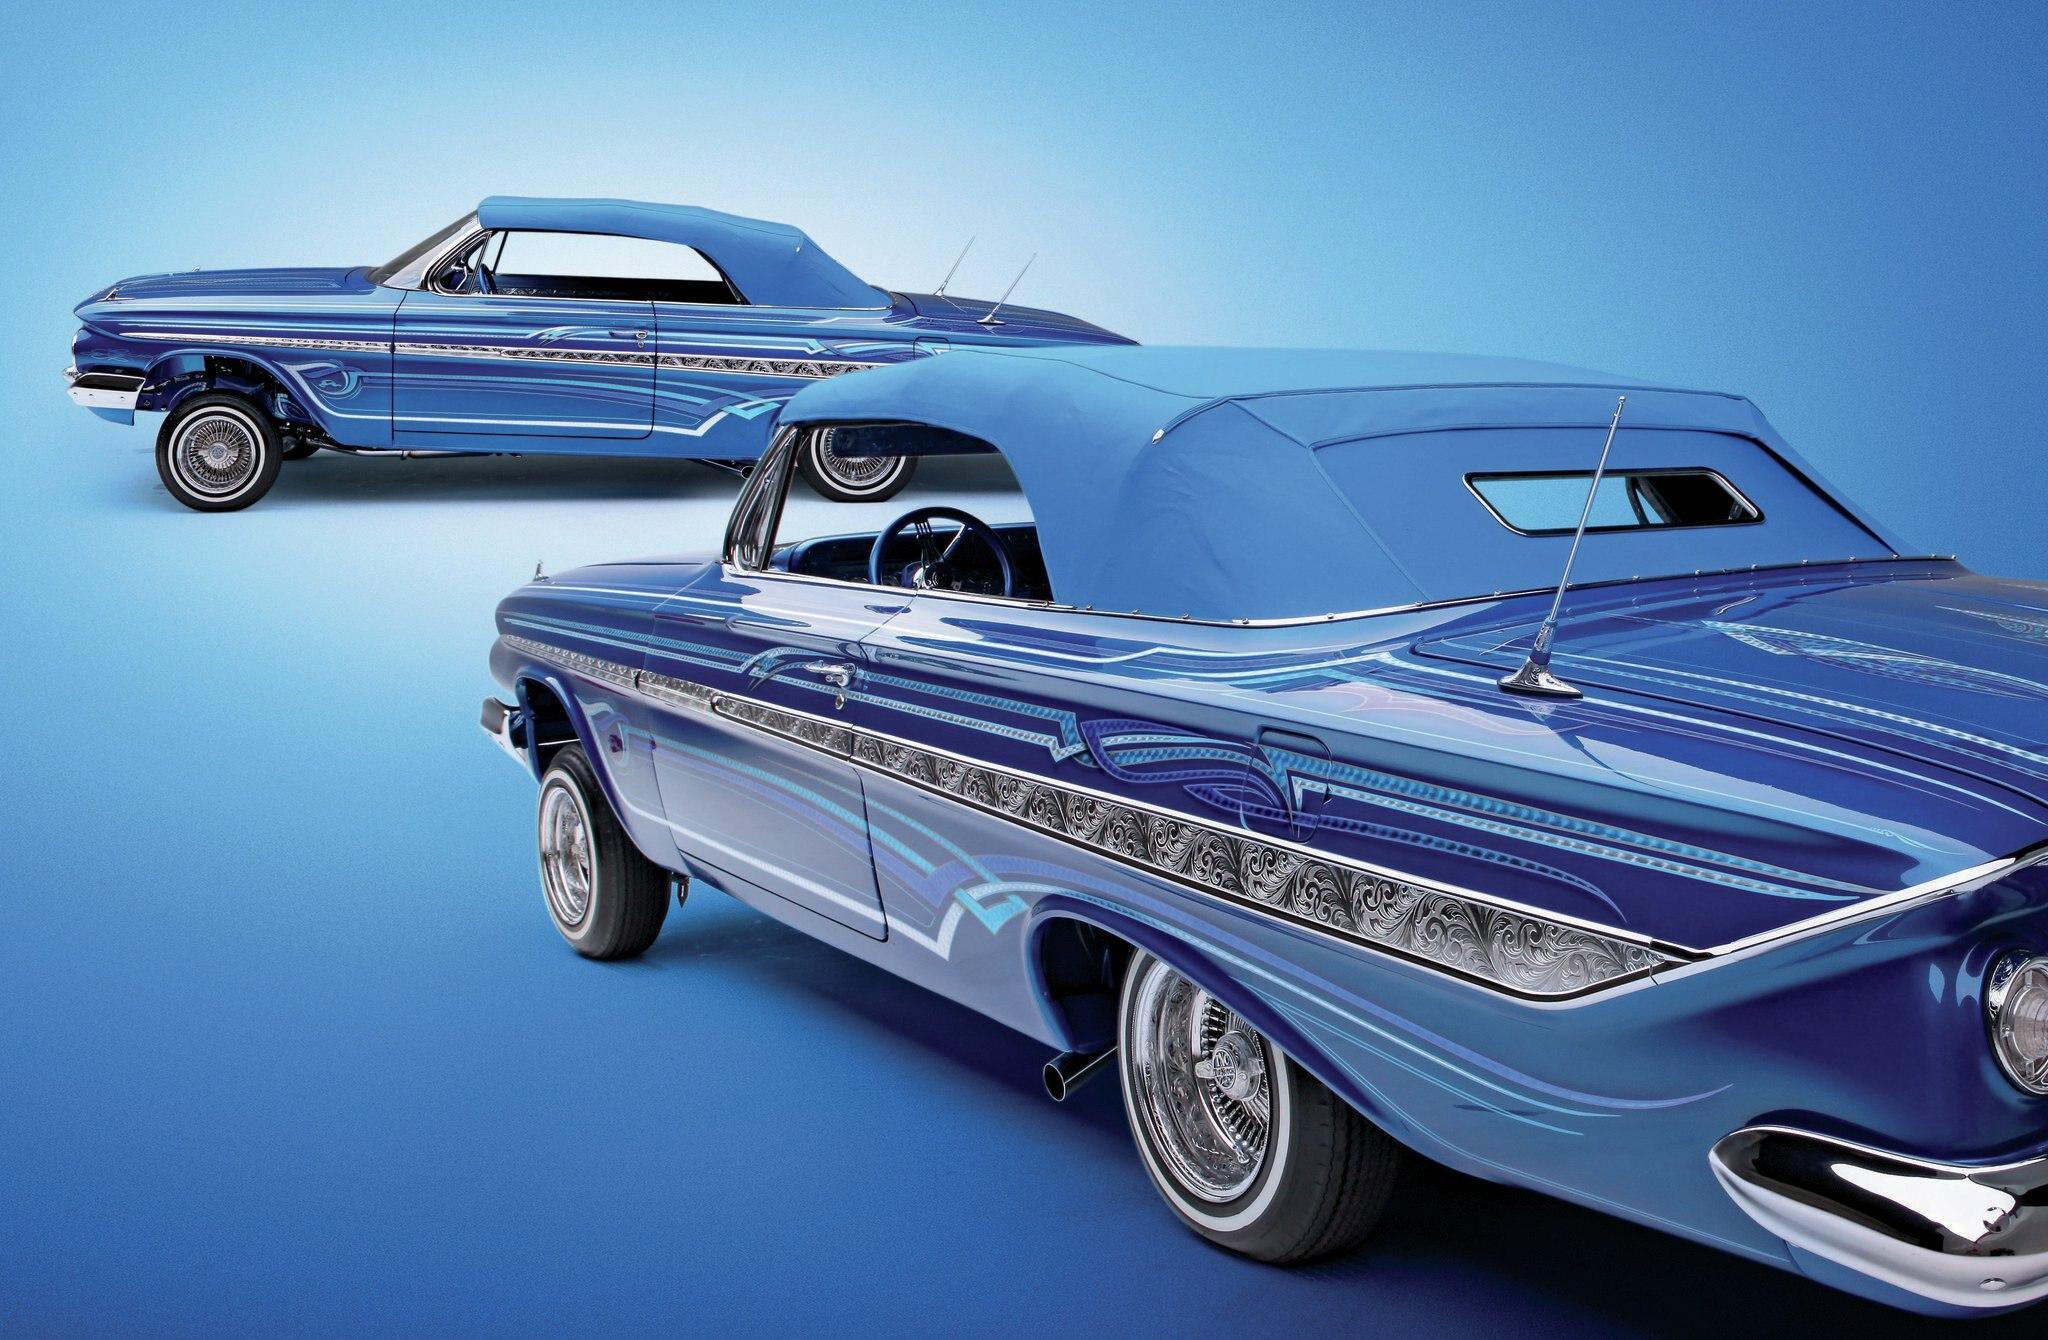 1961-chevrolet-impala-convertible-021